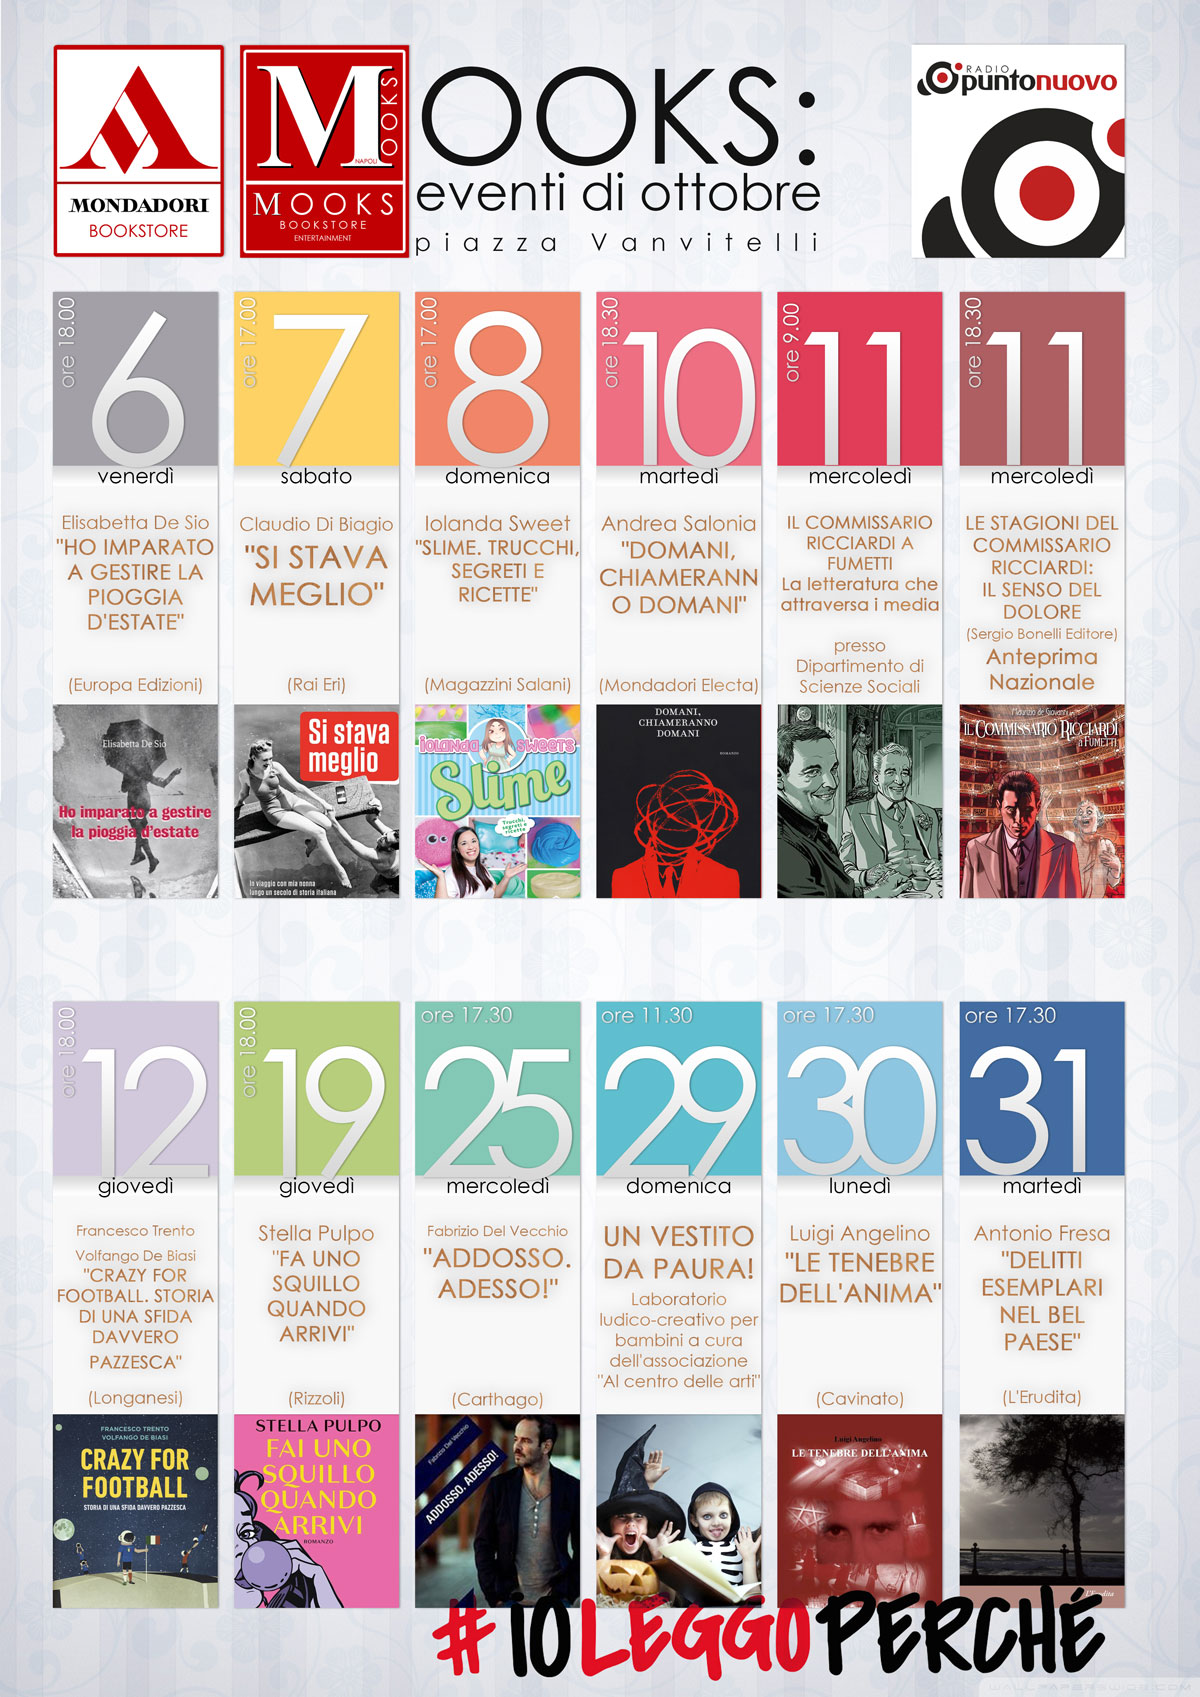 Calendario Ottobre Mondadori MOOKS Napoli